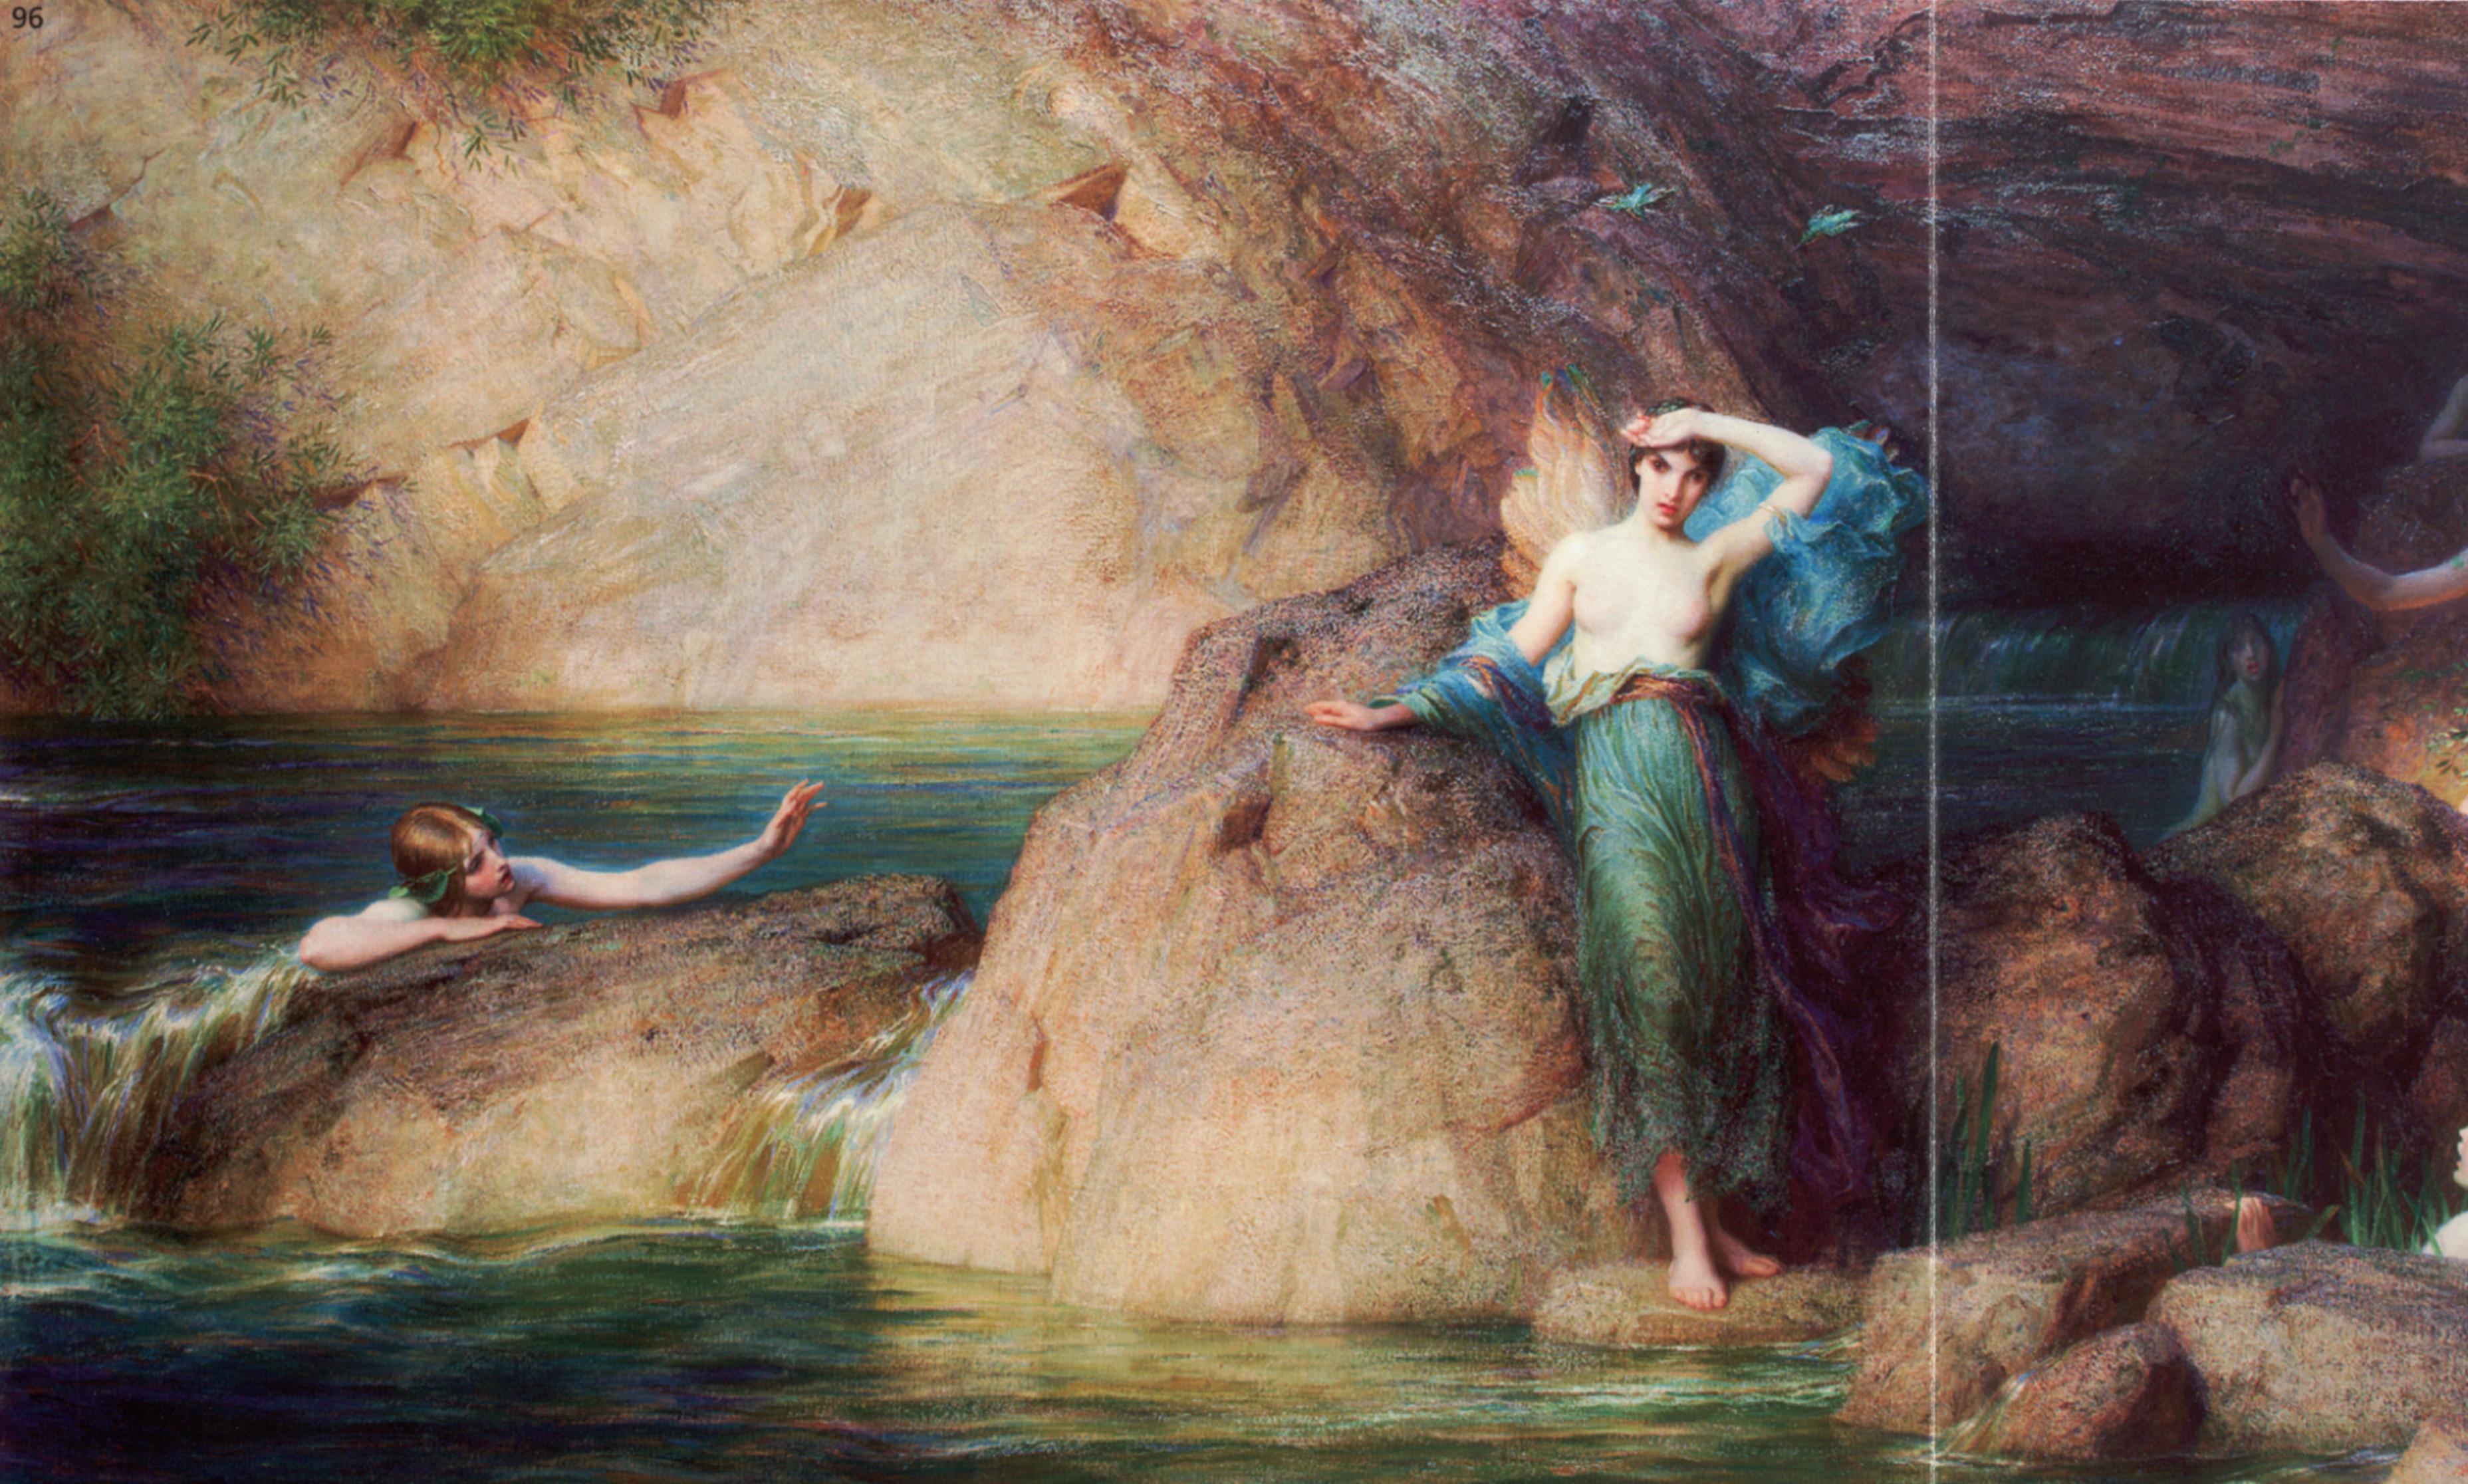 Herbert_James_Draper_-_Halcyone_(1915)